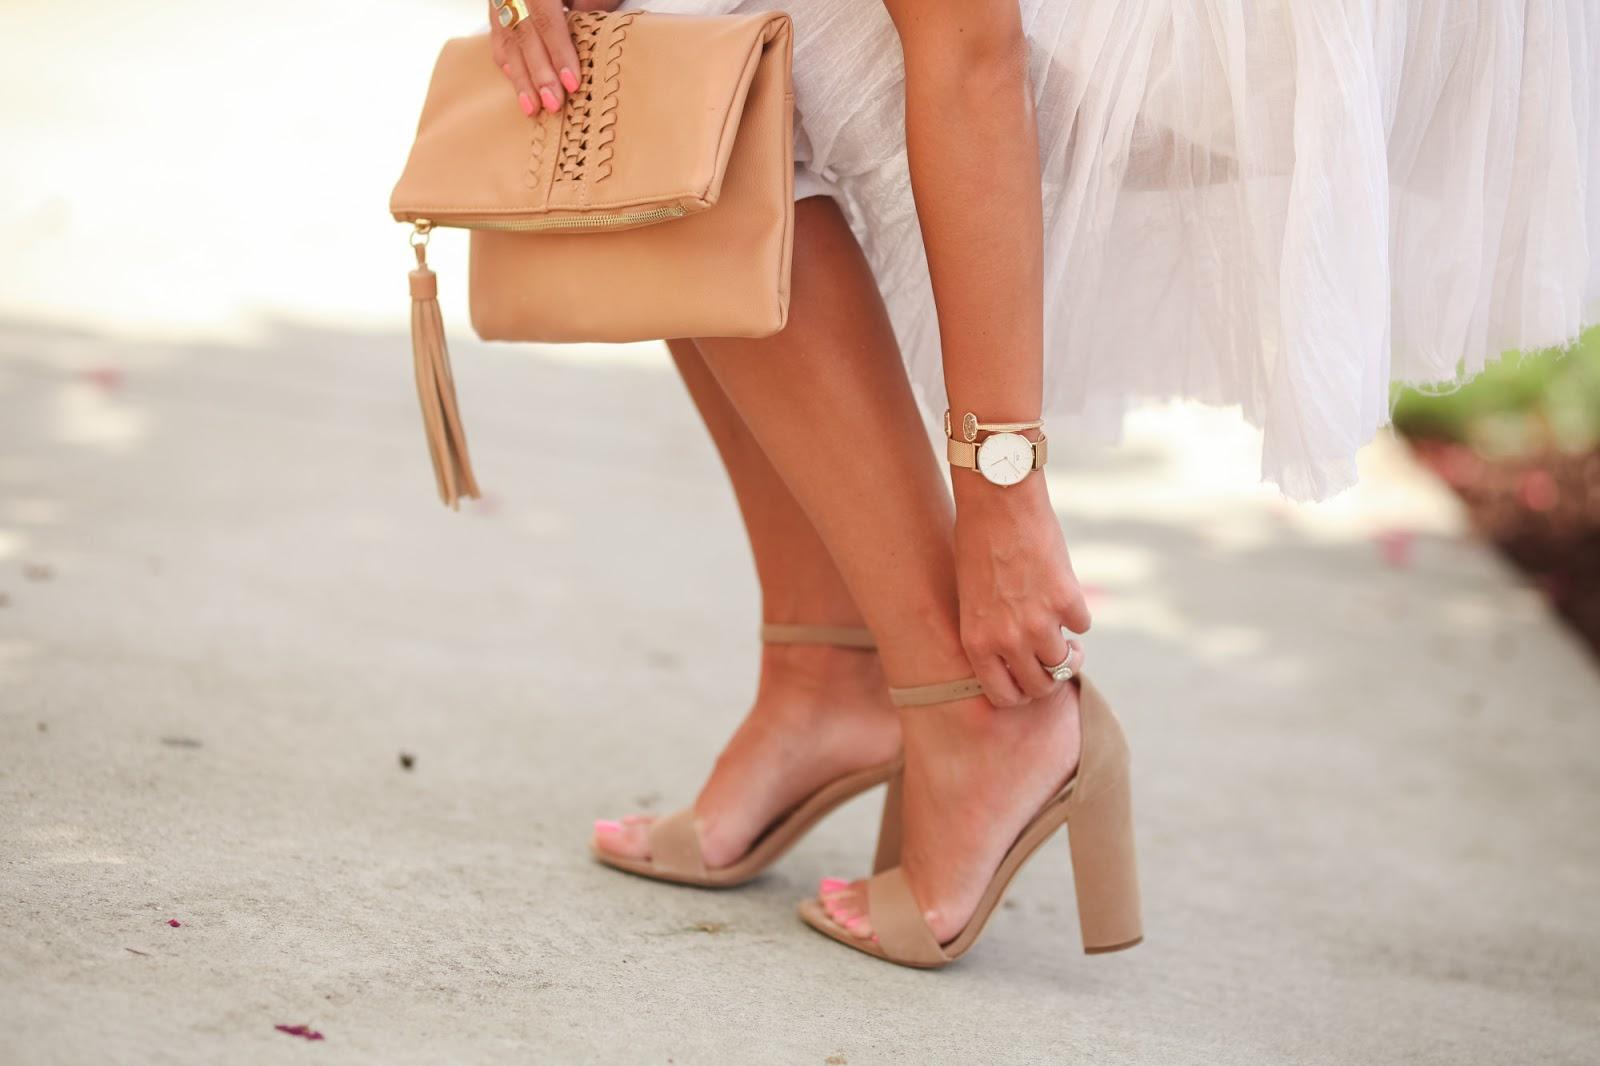 e0dfecf0d Sam Edelman Yaro Ankle Strap Sandals    Free People Lace Mini Dress     Kendra Scott Kirsten Earrings    Brown Clutch